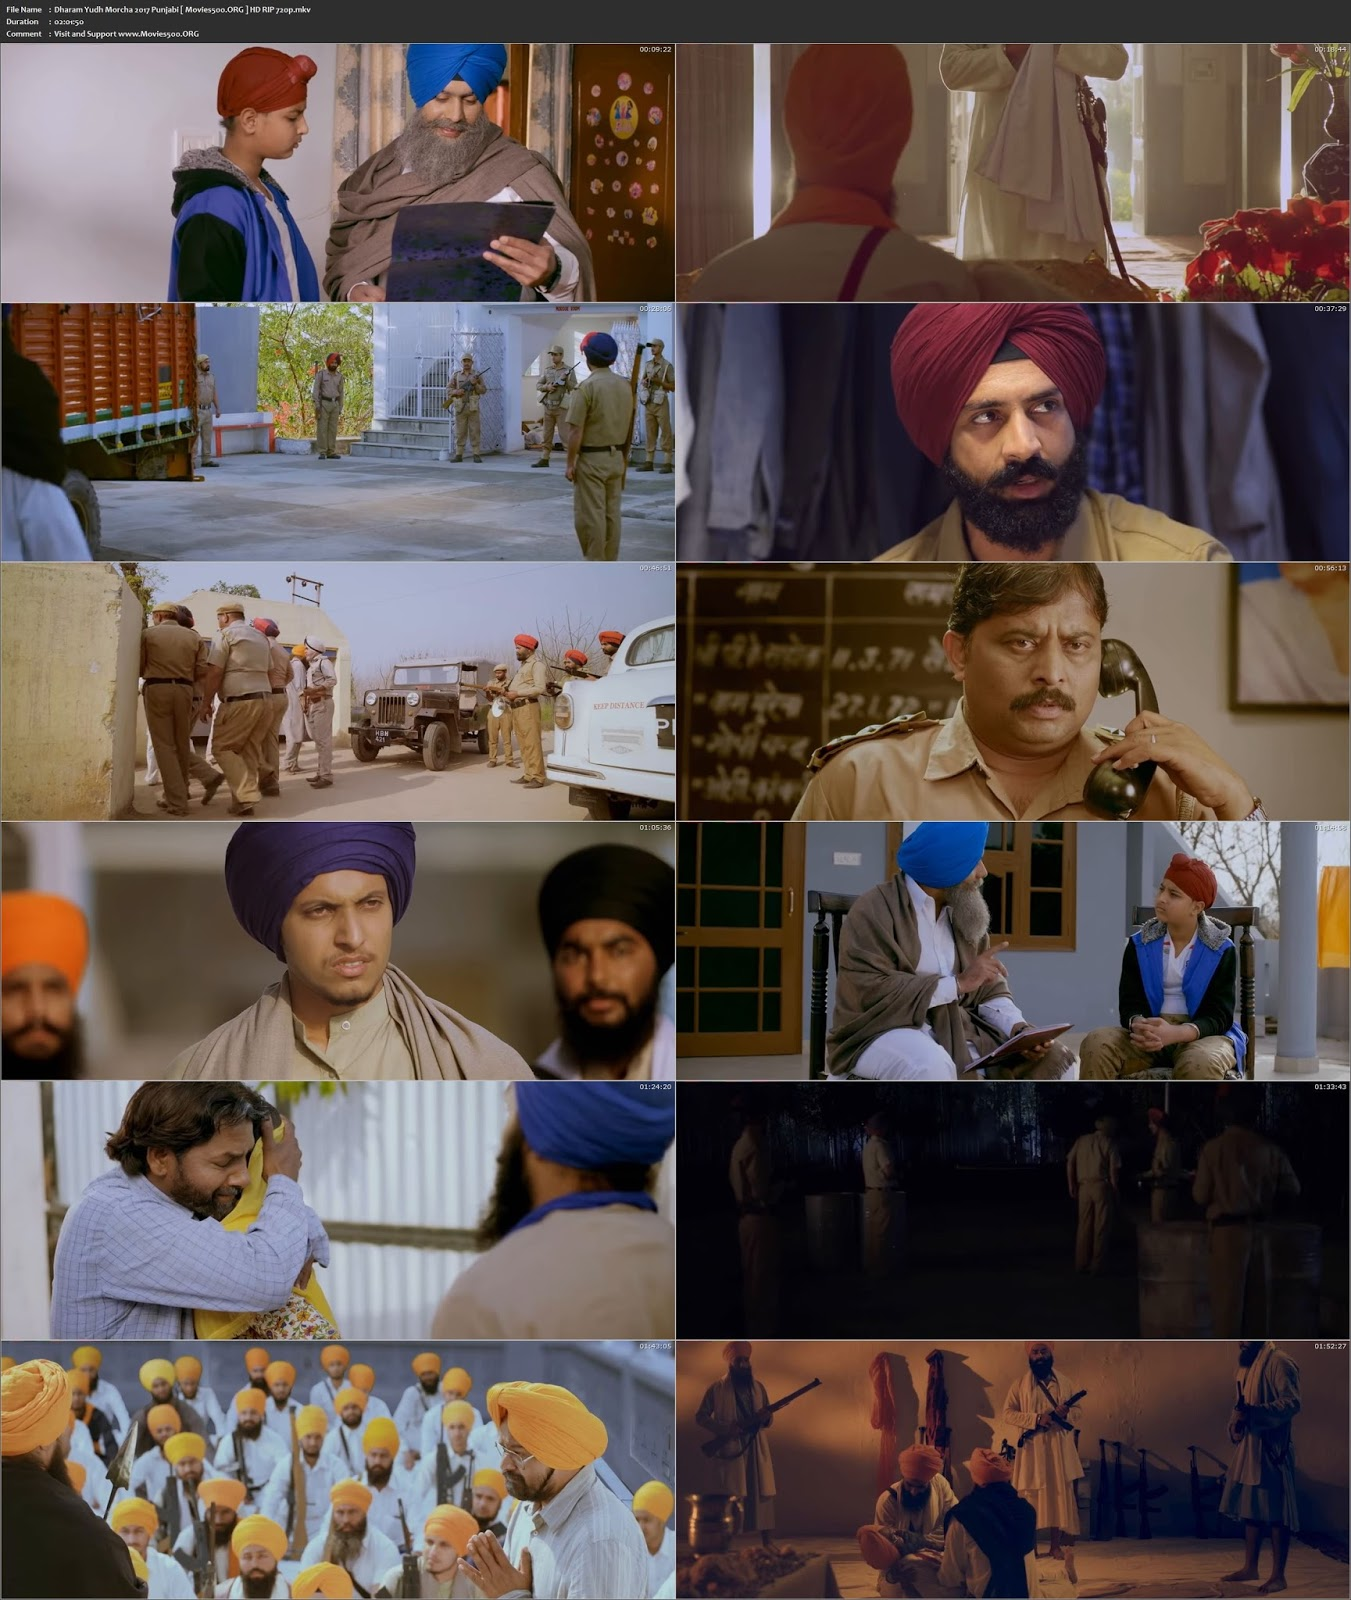 Dharam Yudh Morcha 2016 Punjabi Download HDRip 720p at movies500.info